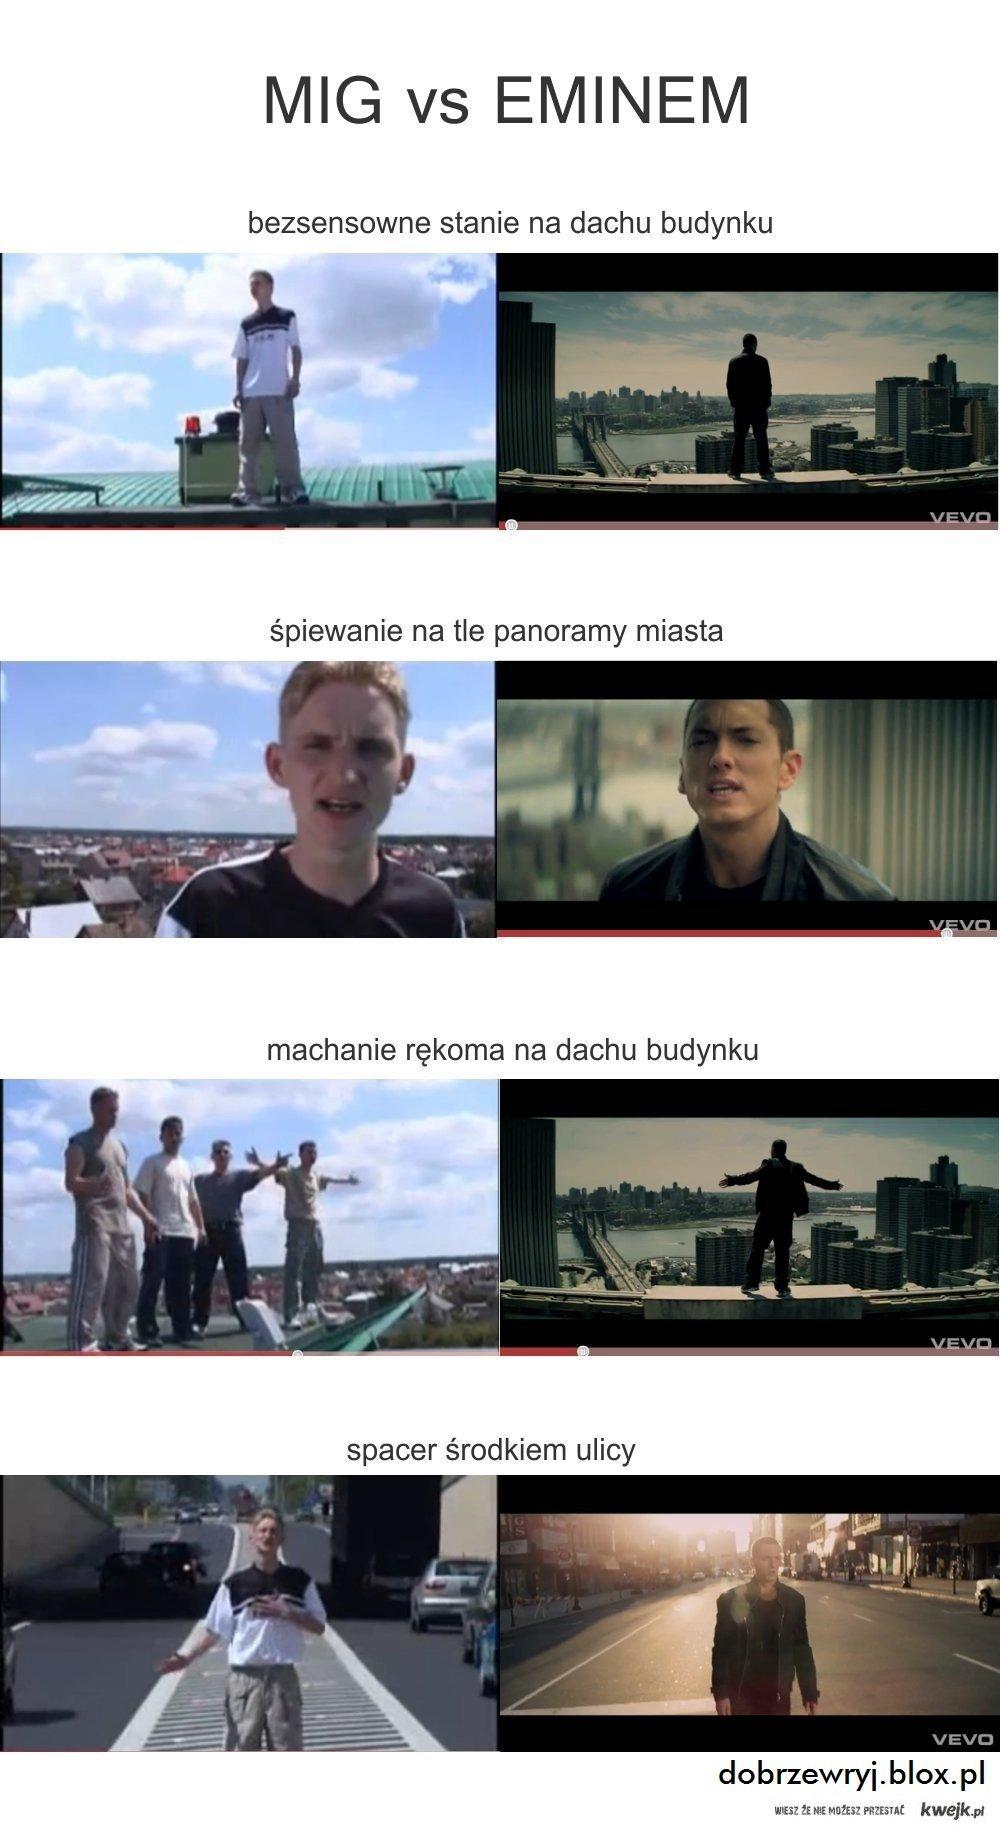 MIG vs Eminem